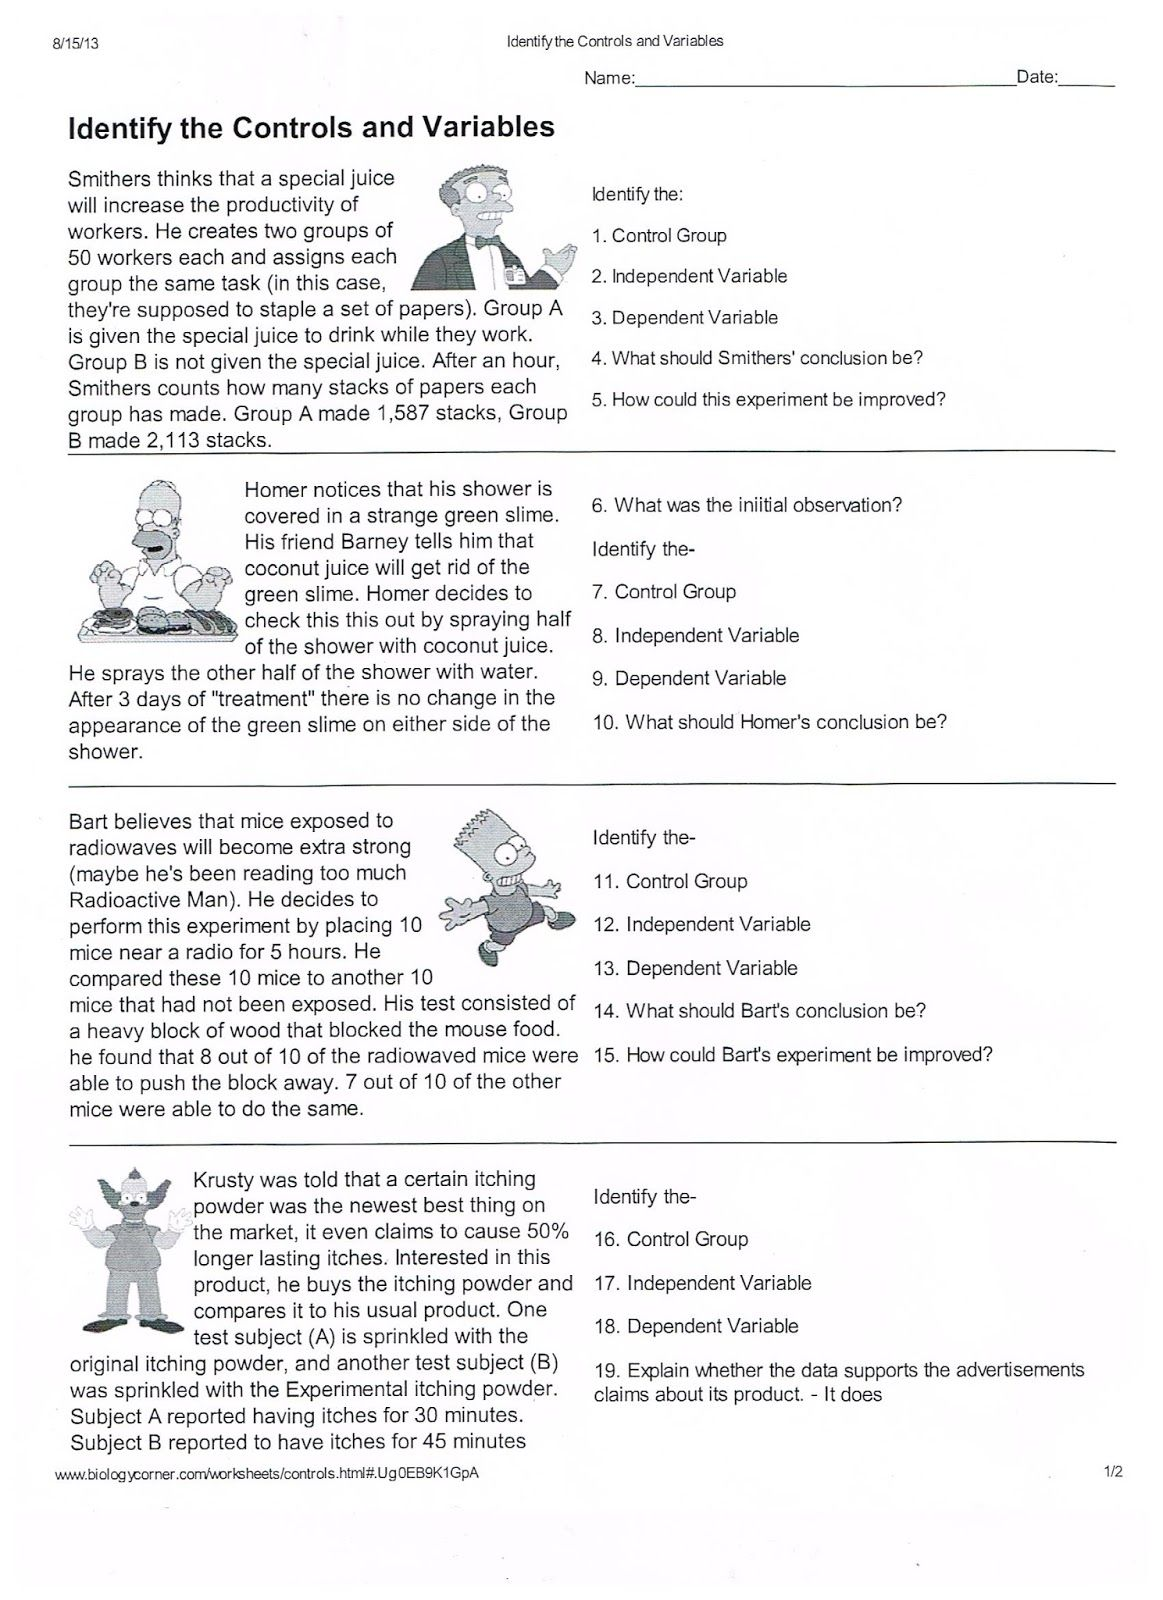 Hypothesis Worksheet Elementary